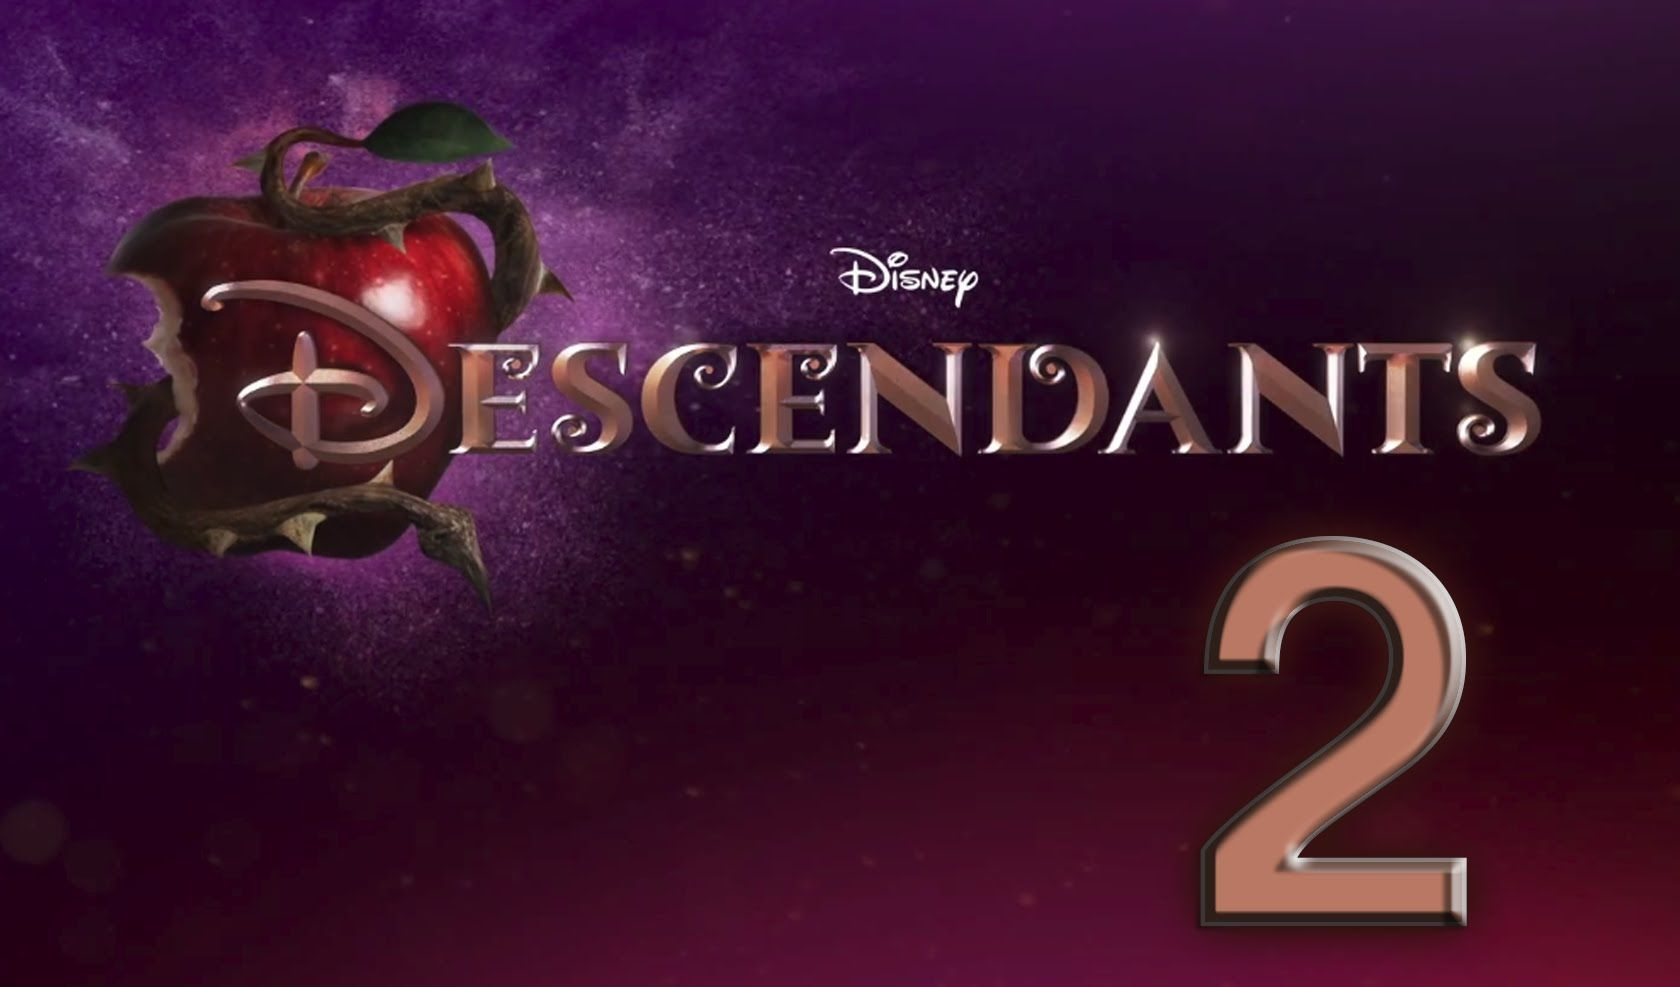 Descendants 2 Logo wallpaper HD 2016 in Movies.